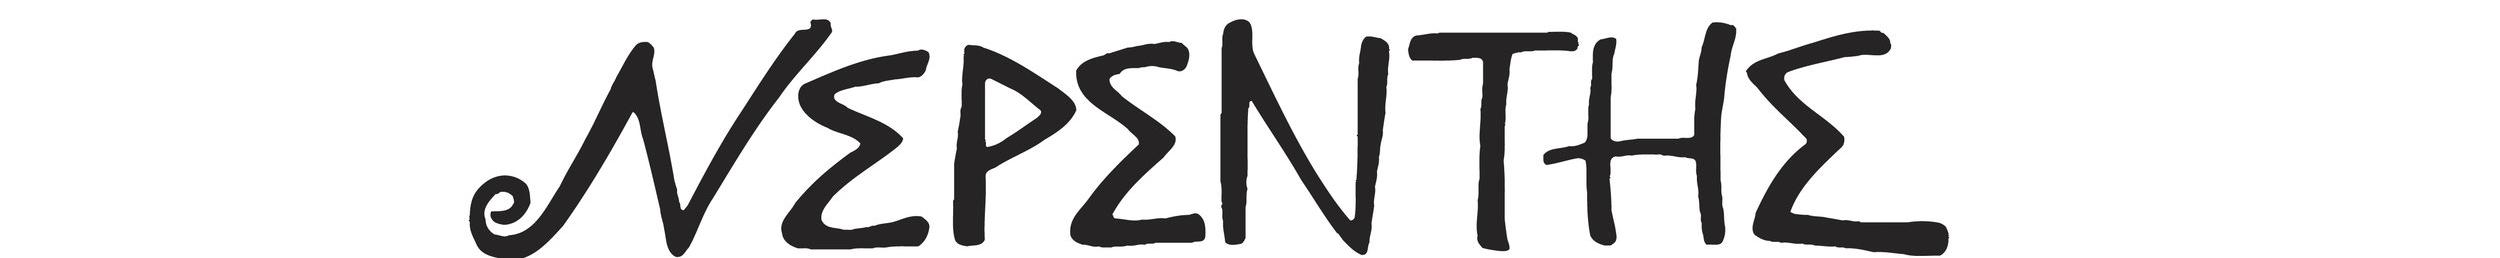 Nepenthe-logo.JPG